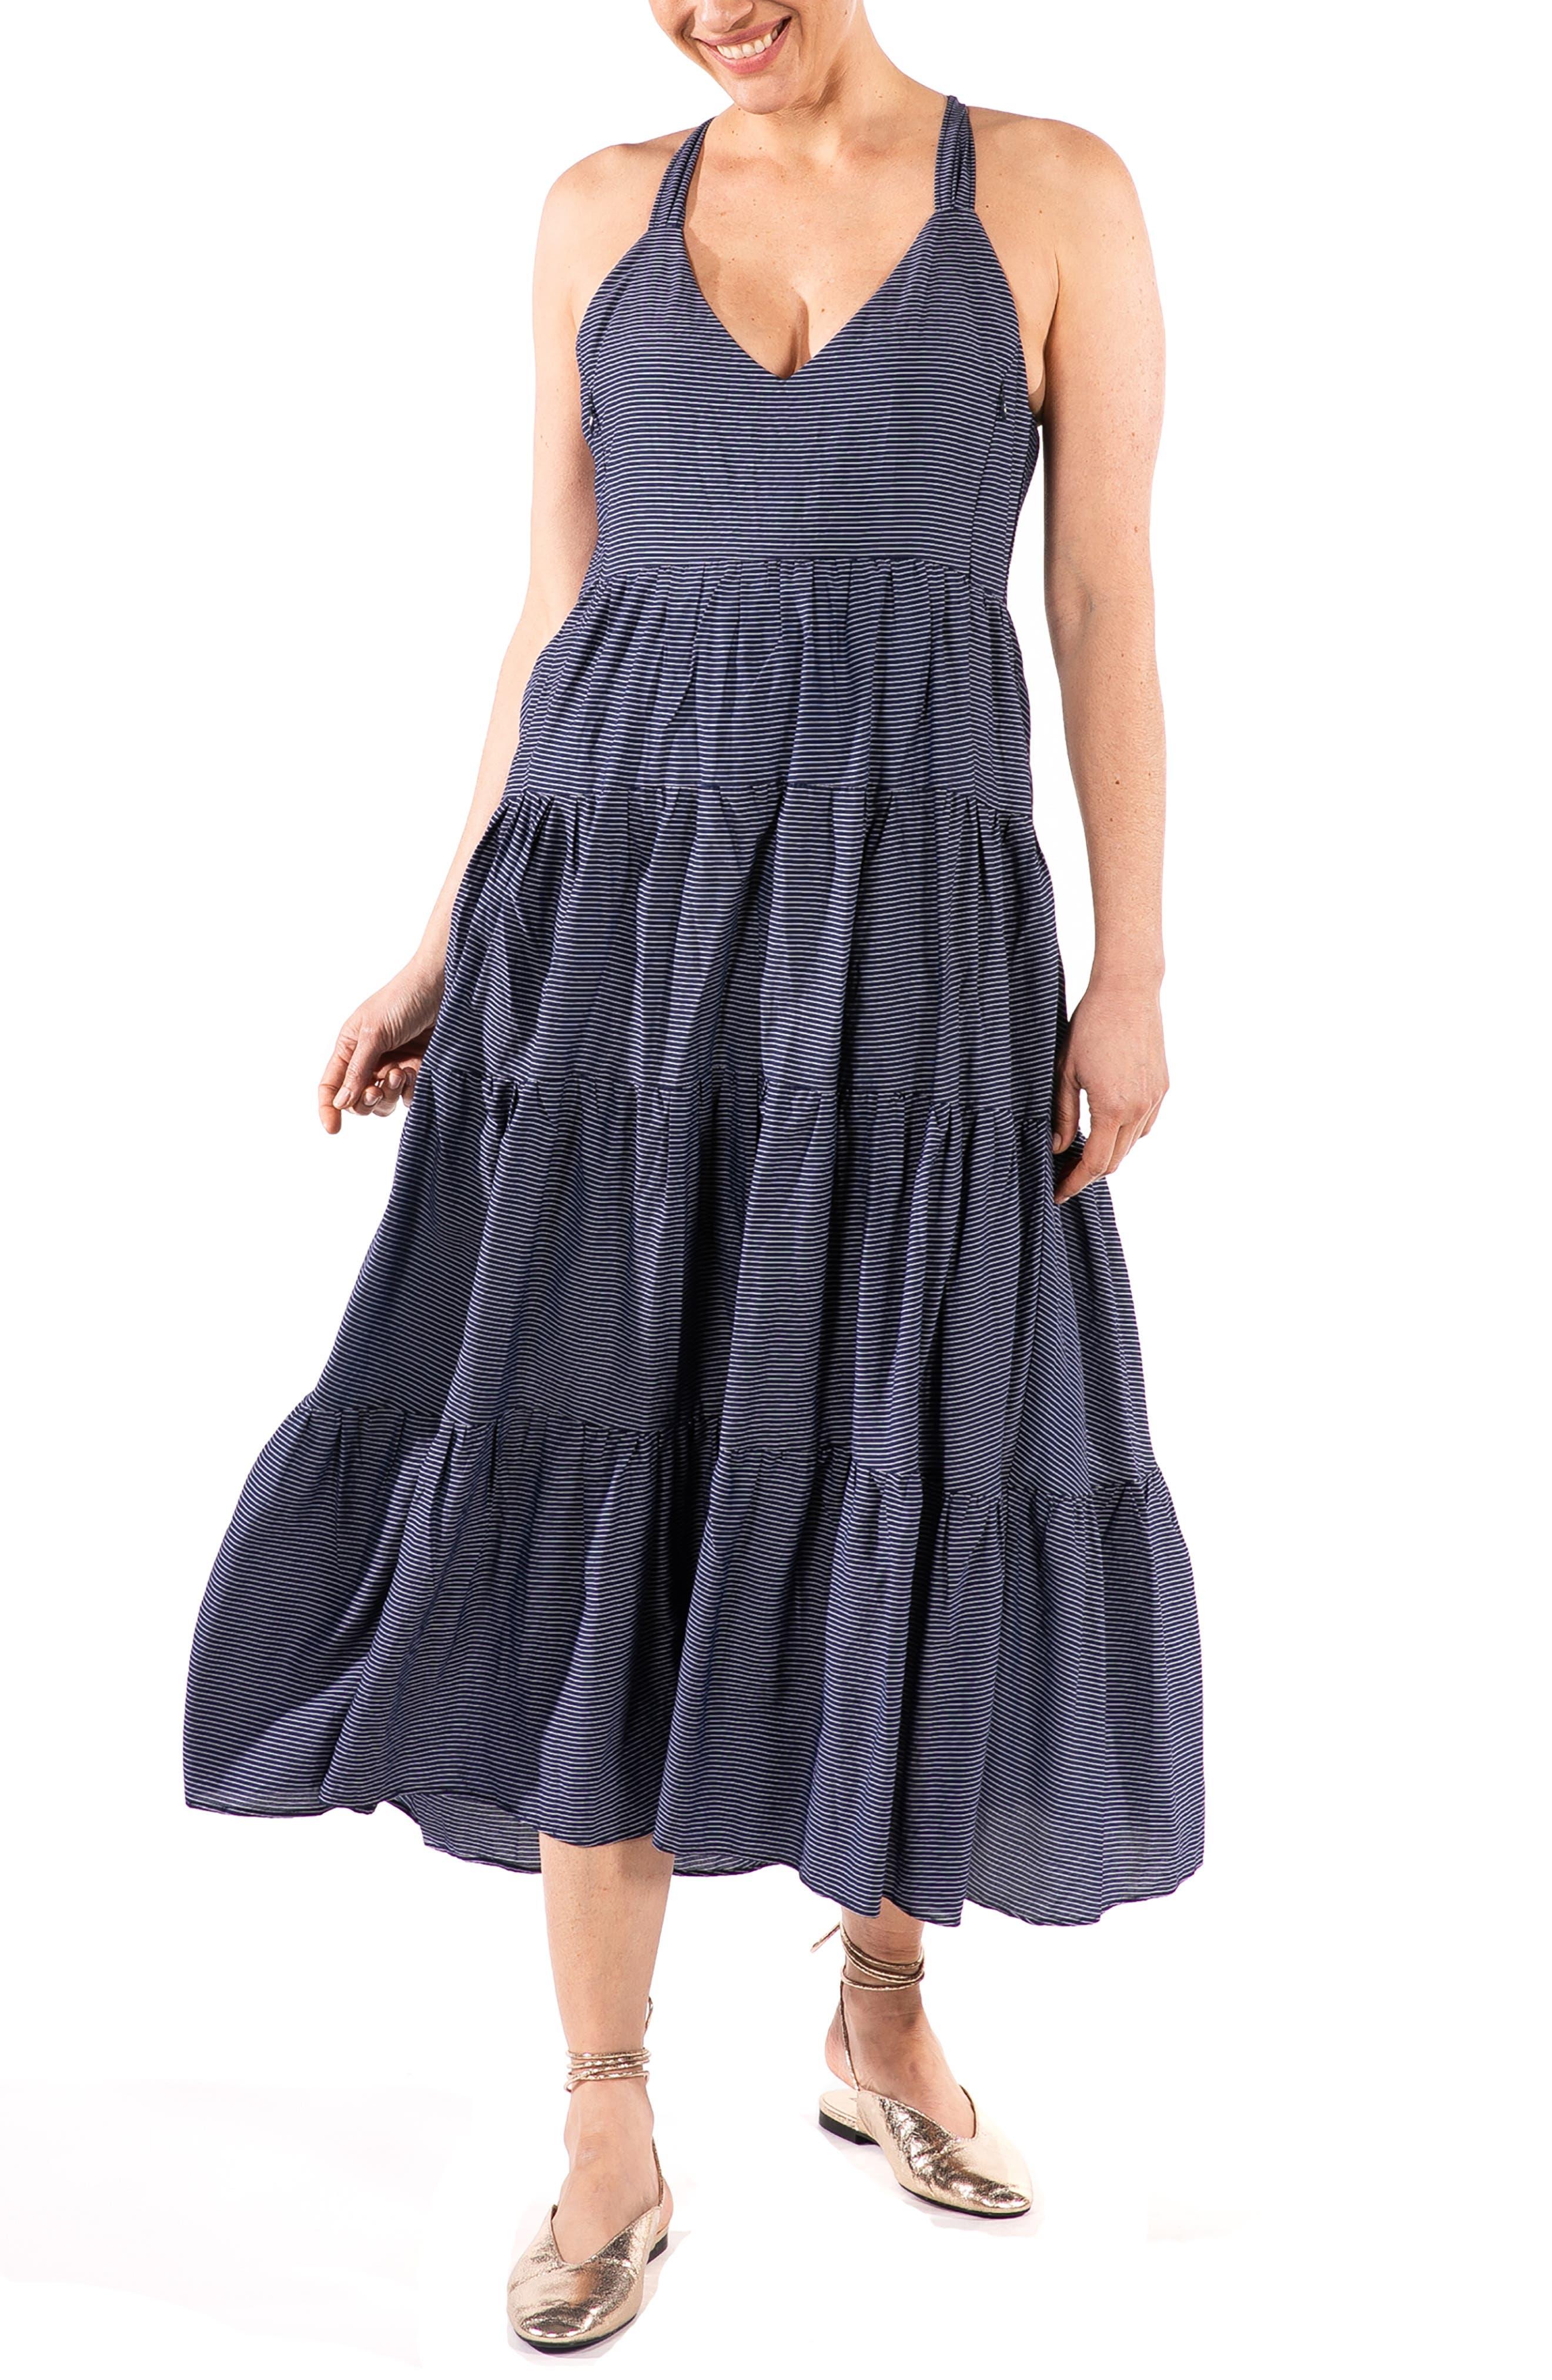 Women's Loyal Hana Rio Maternity/nursing Dress